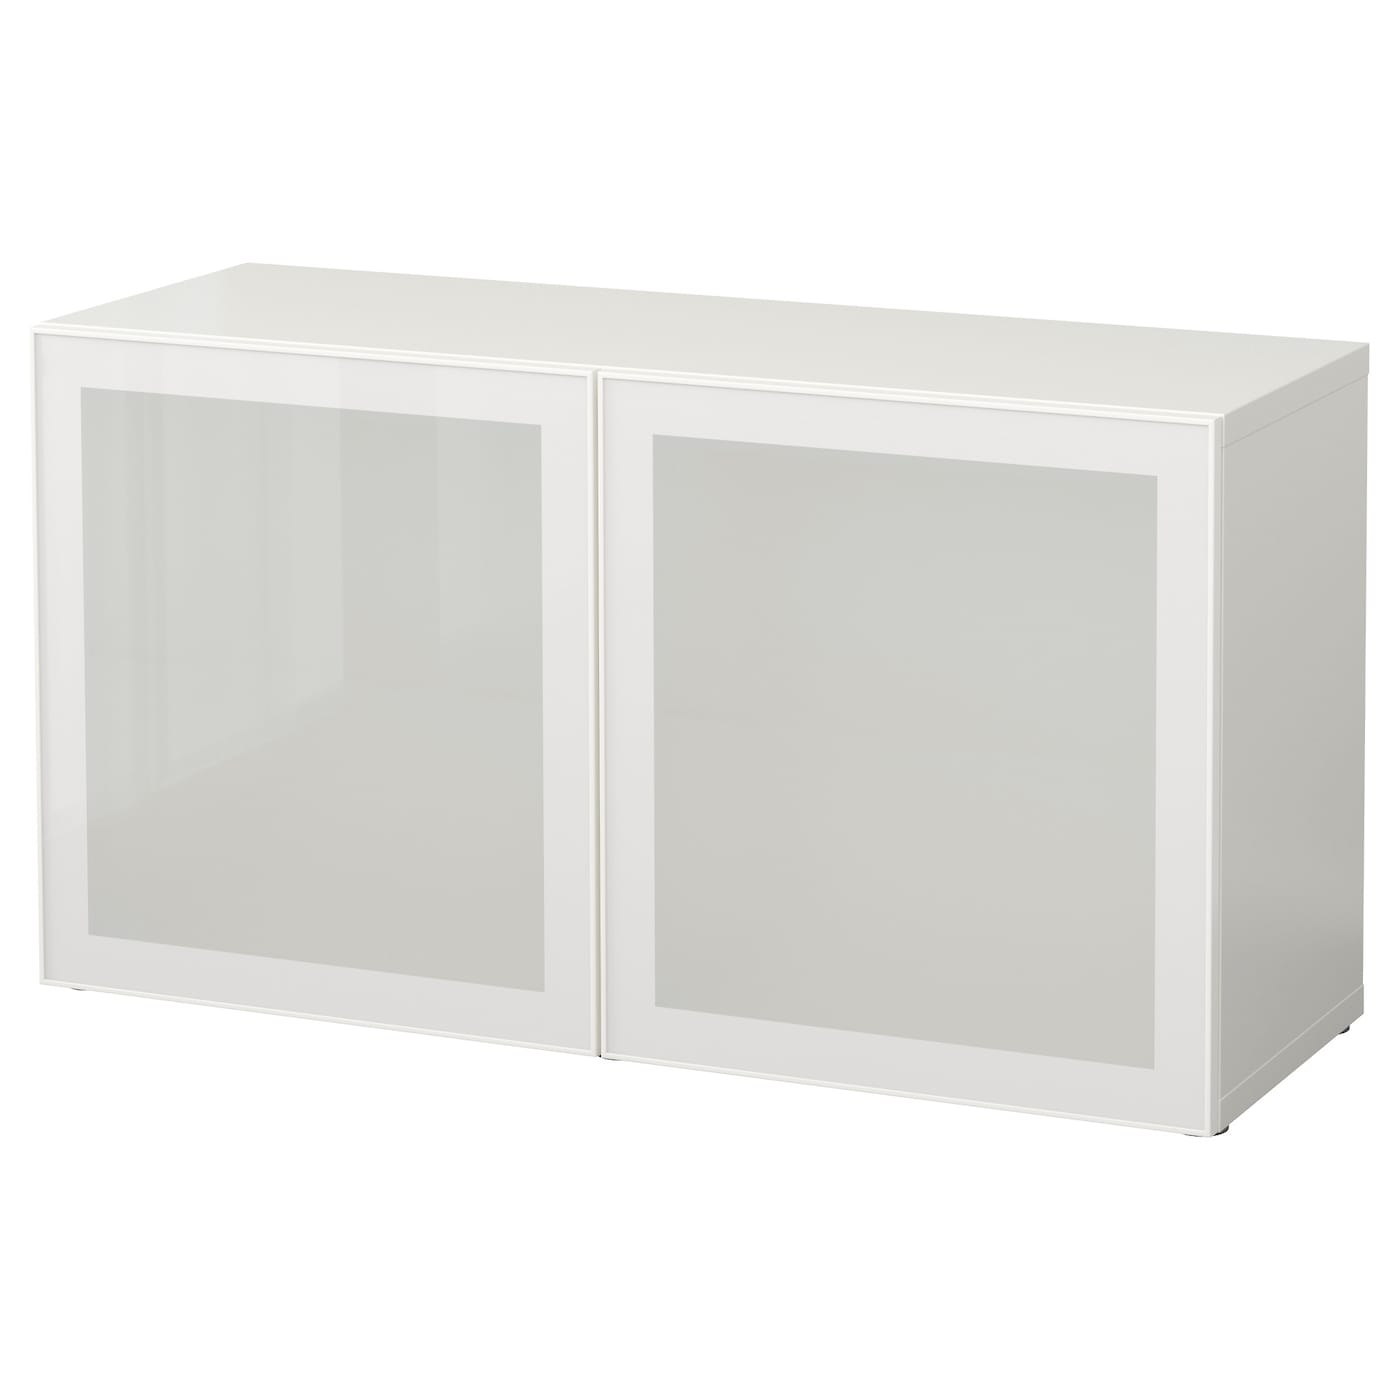 Best Shelf Unit With Glass Doors Whiteglassvik Whitefrosted Glass